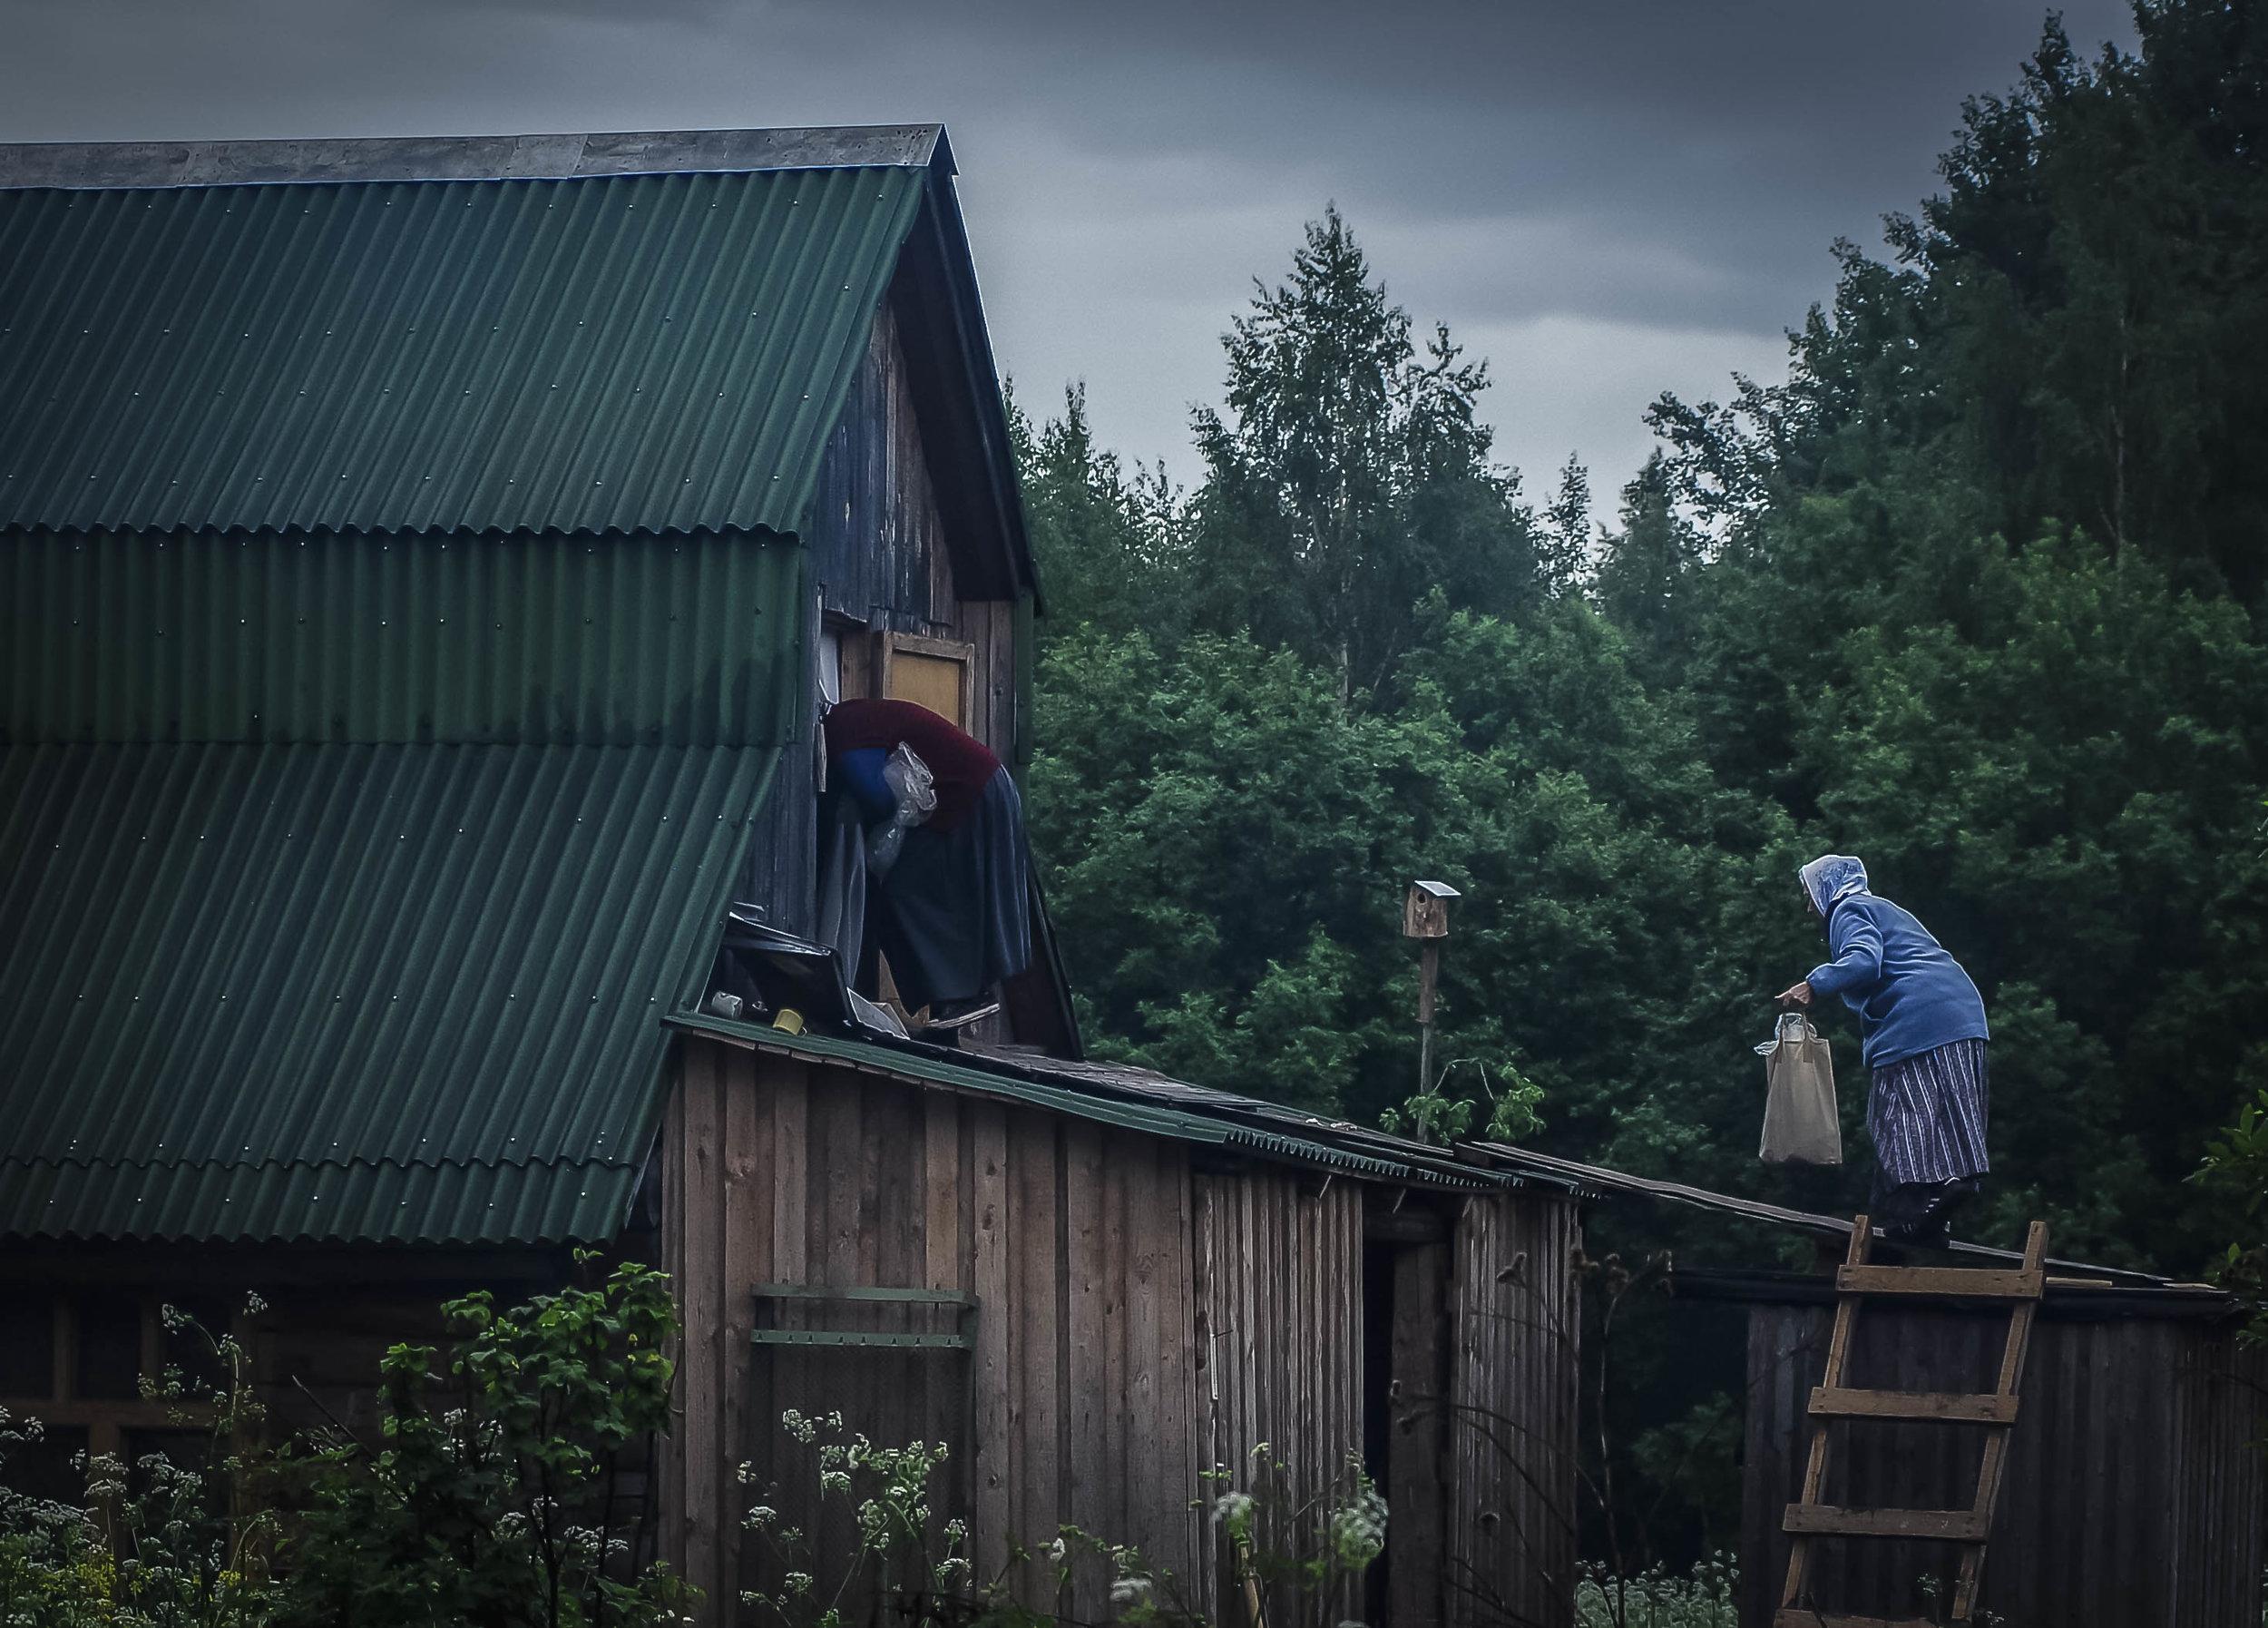 Pilgrims climbing into a hayloft to rest, Goroxovo, June 2010